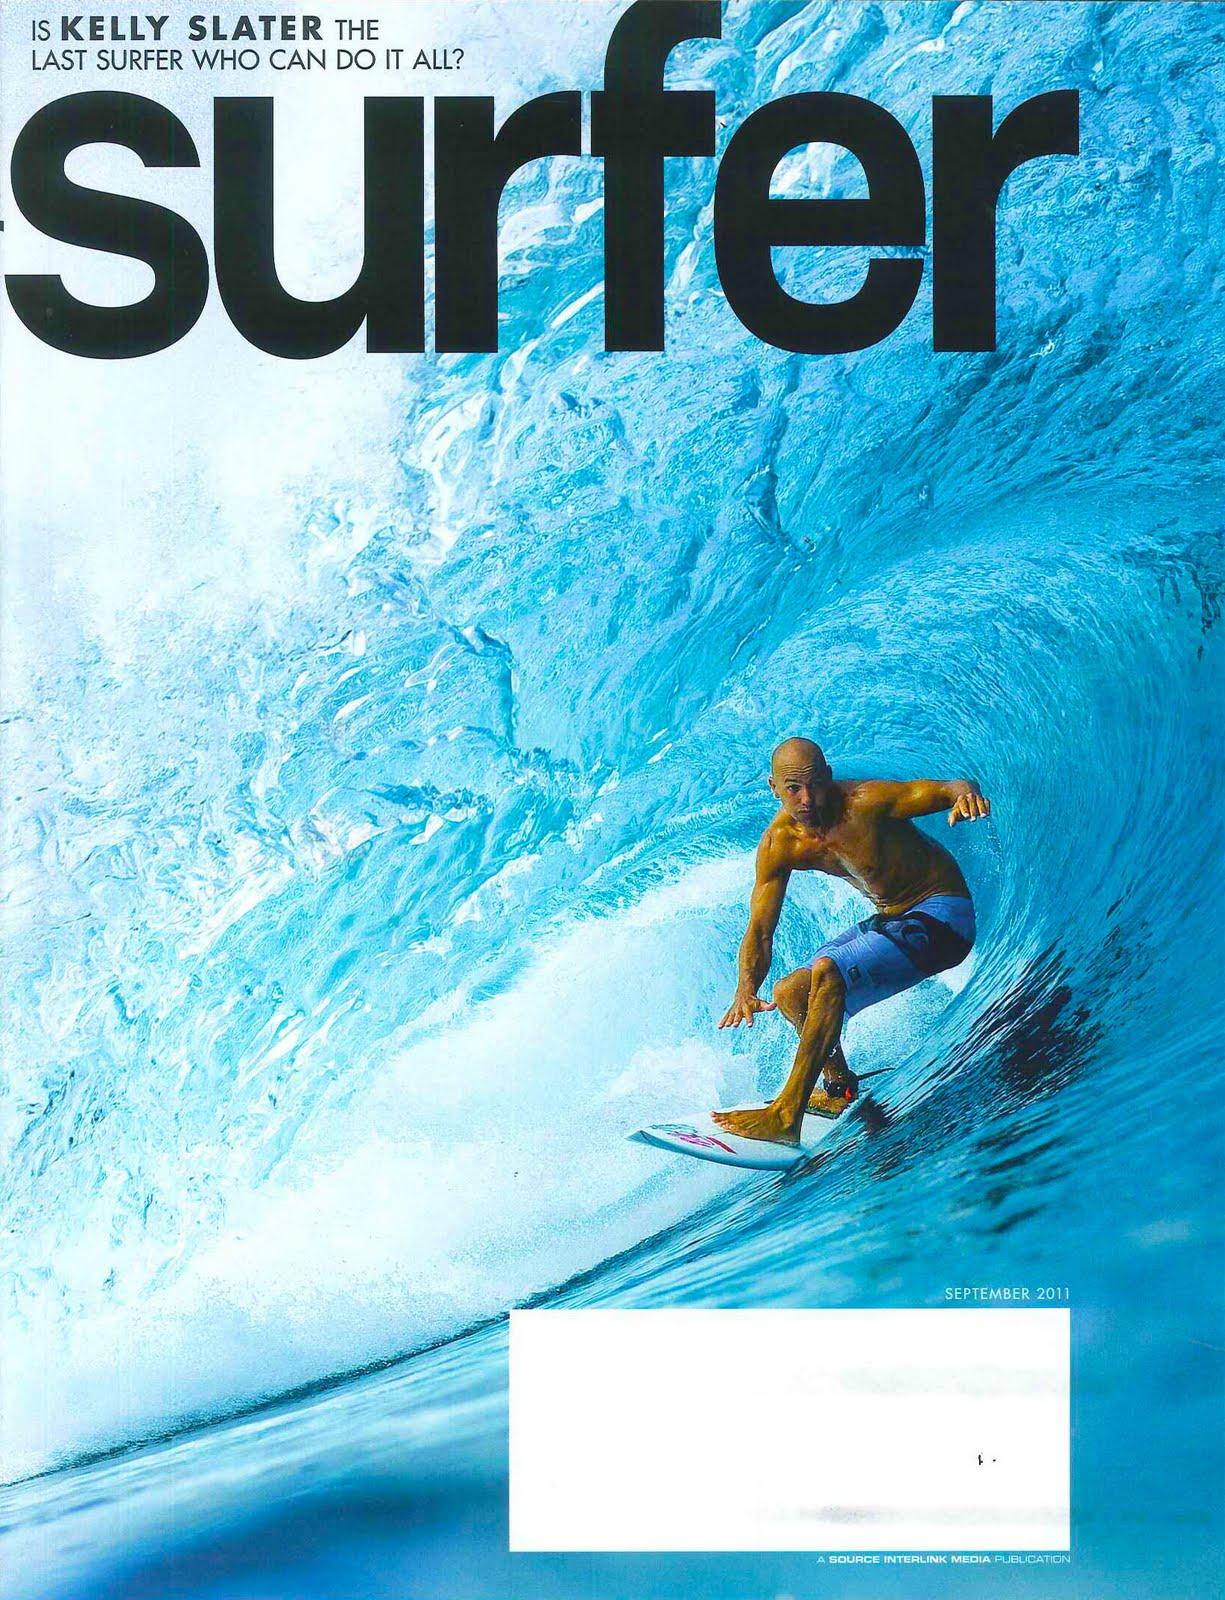 Quiksilver PR Quiksilver Athletes Featured in Surfer Magazine